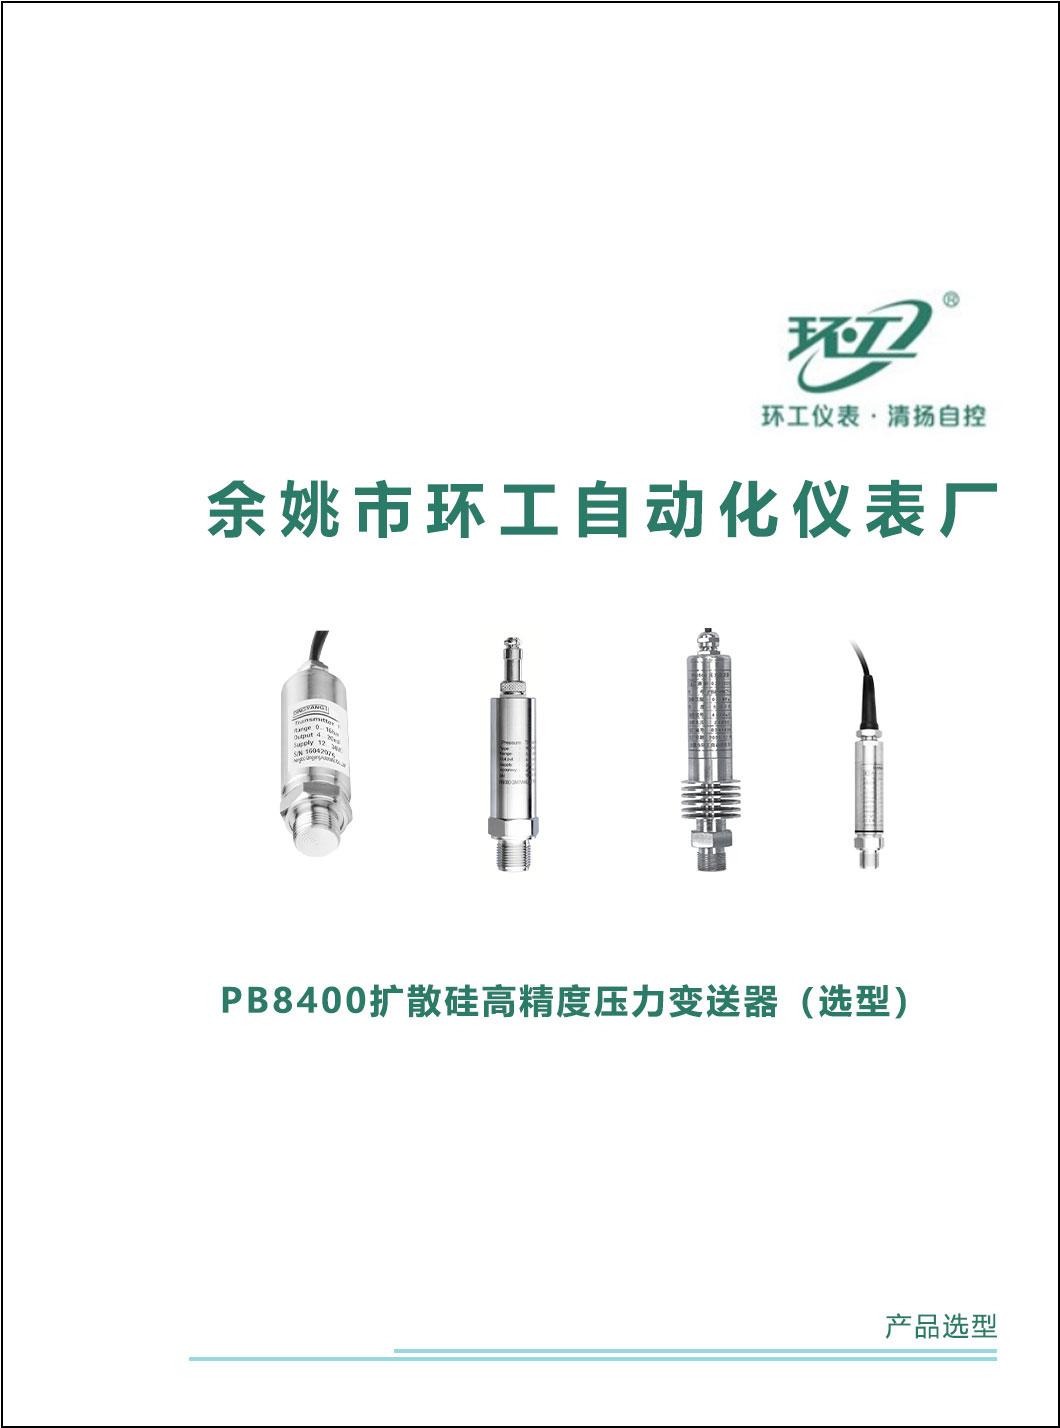 PB8400扩散硅高精度压力变送器-环工仪表-清扬自控